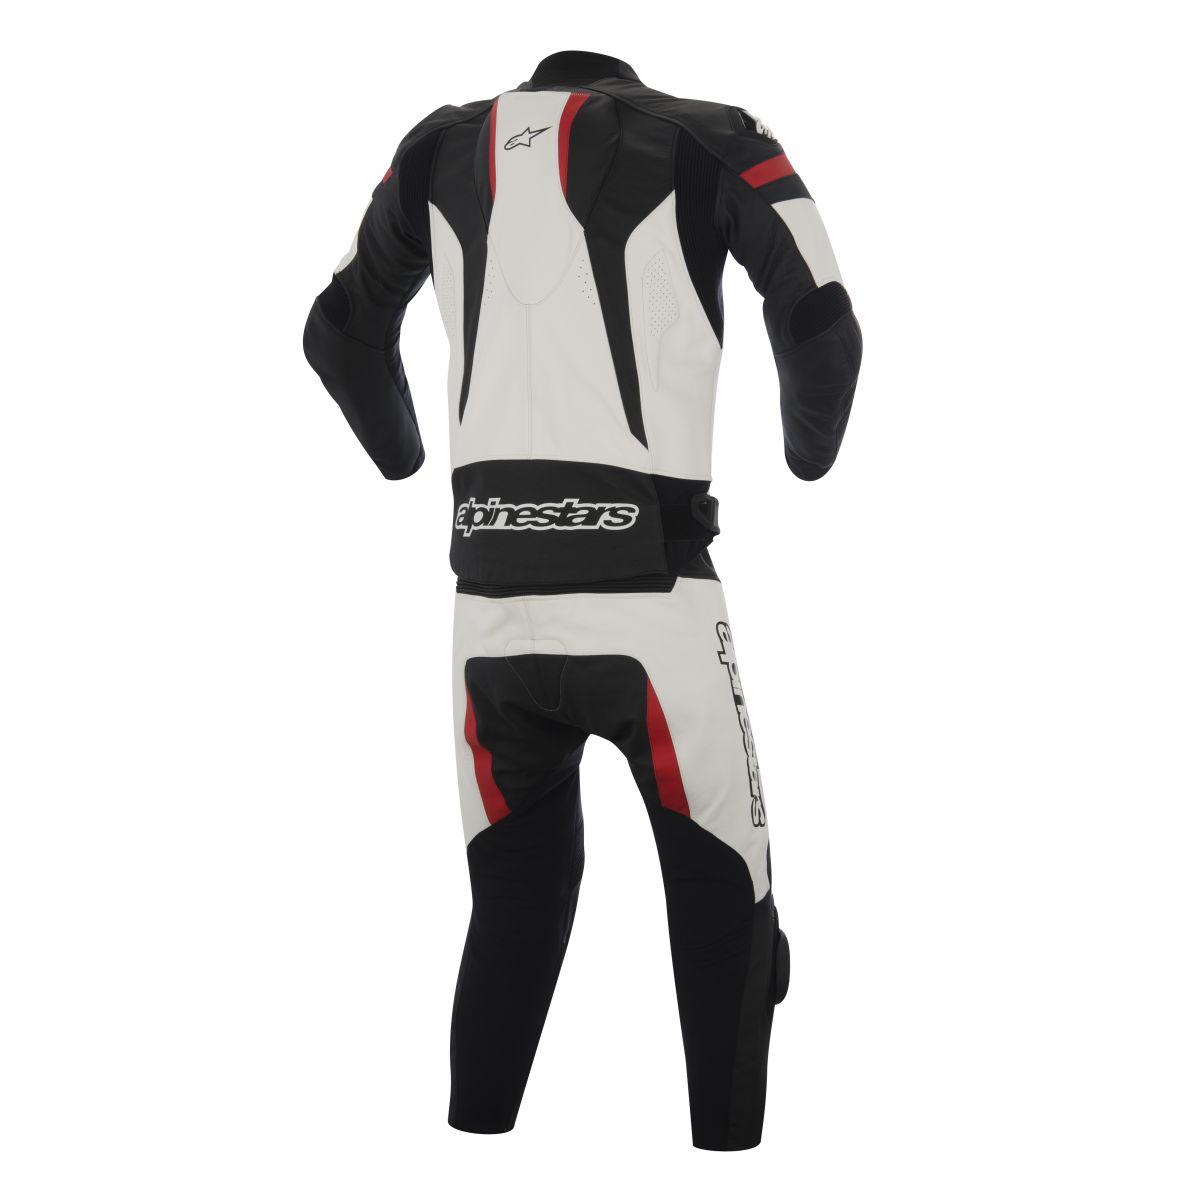 Macacão Alpinestars GP Pro - 2 pçs Tricolor vermelho  - Super Bike - Loja Oficial Alpinestars